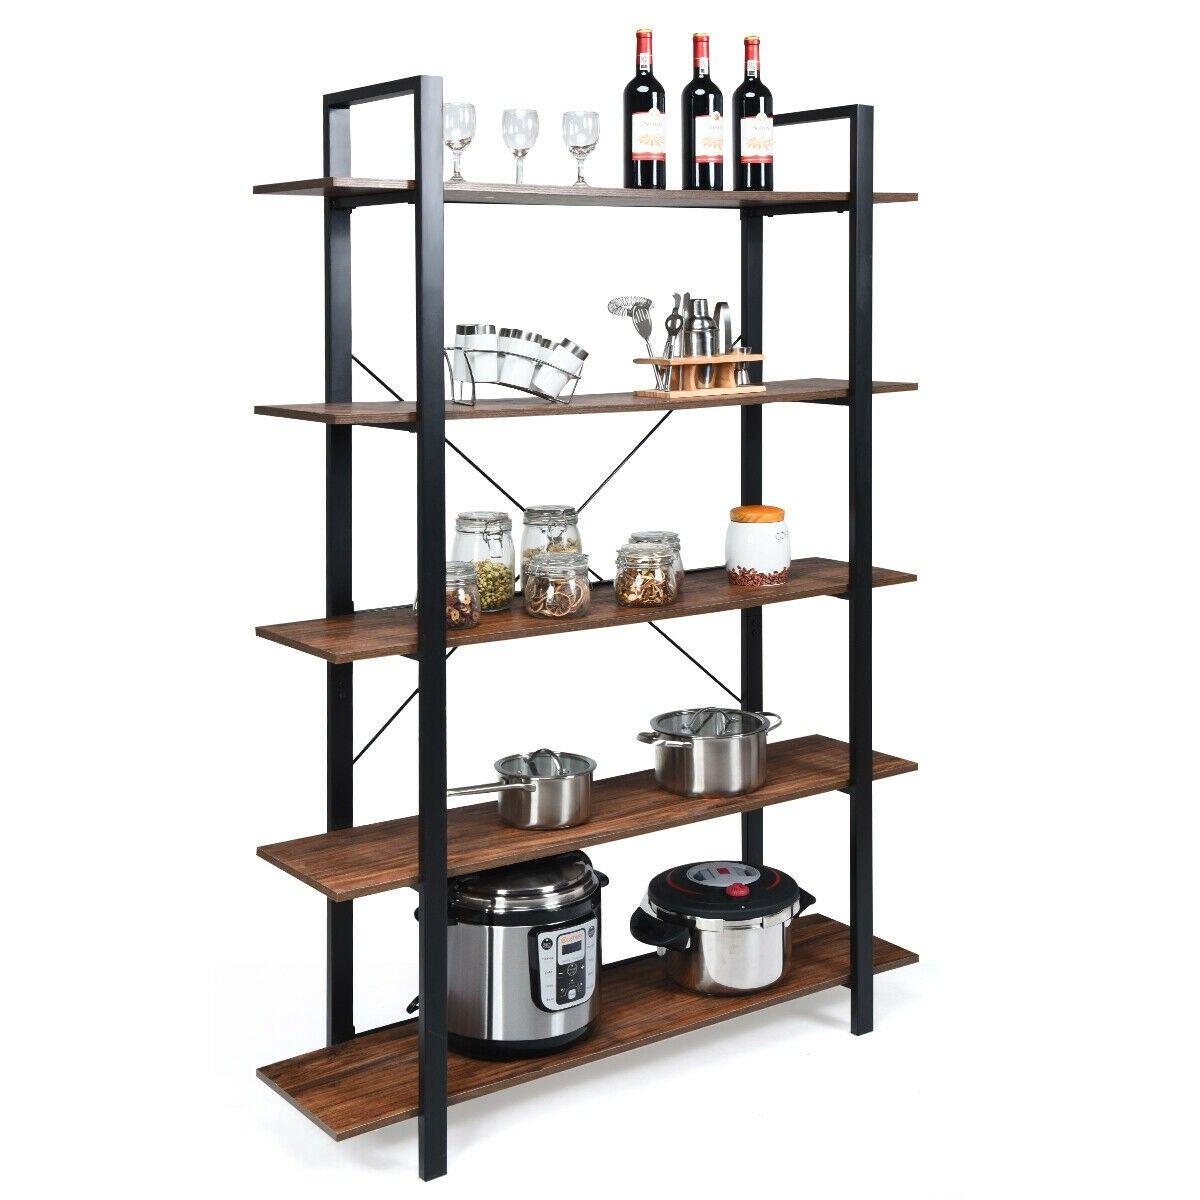 5 Tiers Bookshelf Industrial Bookcases Metal Frame Shelf Stand Shelves Frame Shelf Display Shelves